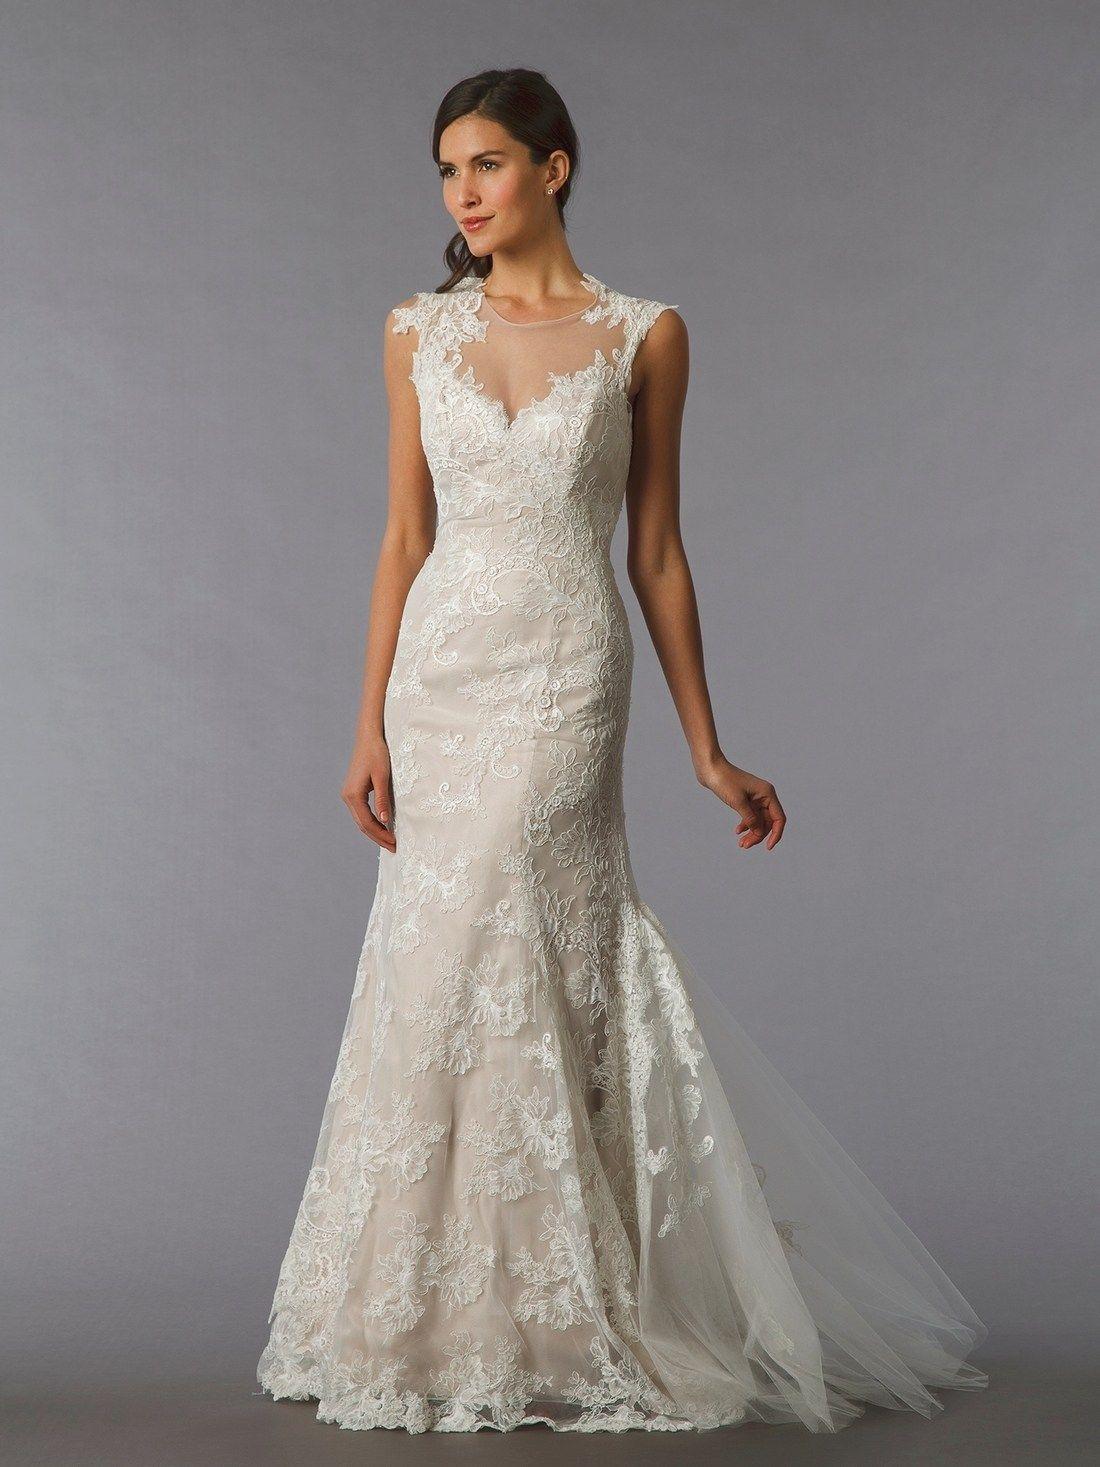 Marisa Wedding Gowns | wedding ideas | Pinterest | Gowns, Bridal ...